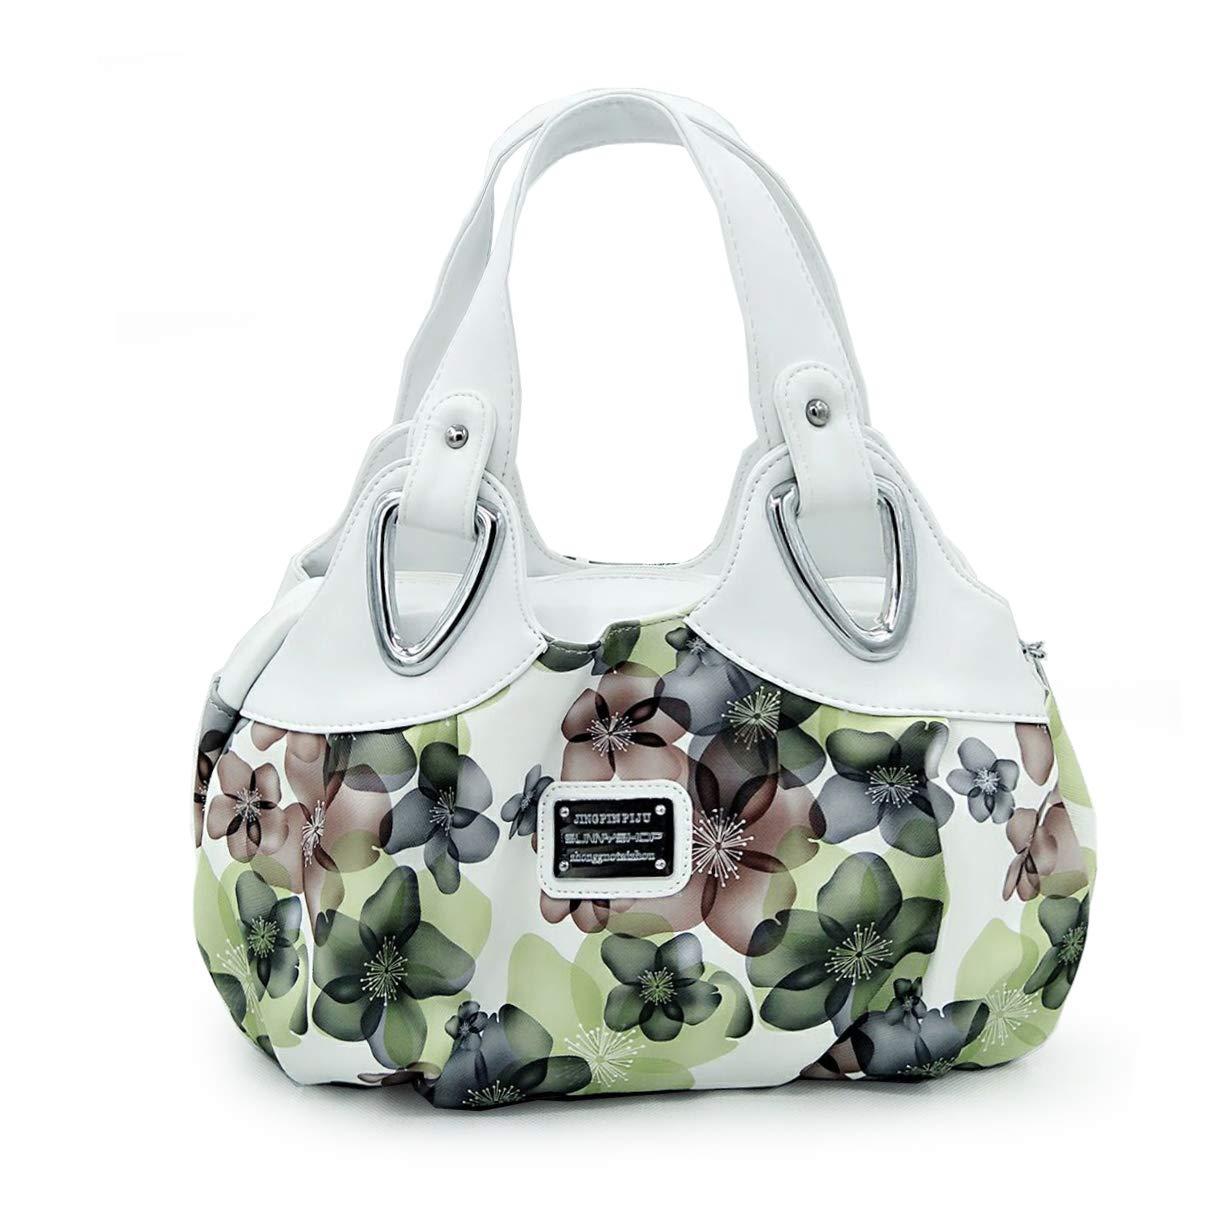 Panzexin Print Floral Bag Medium Handbag for Ladies Top-handle Handbags for Women